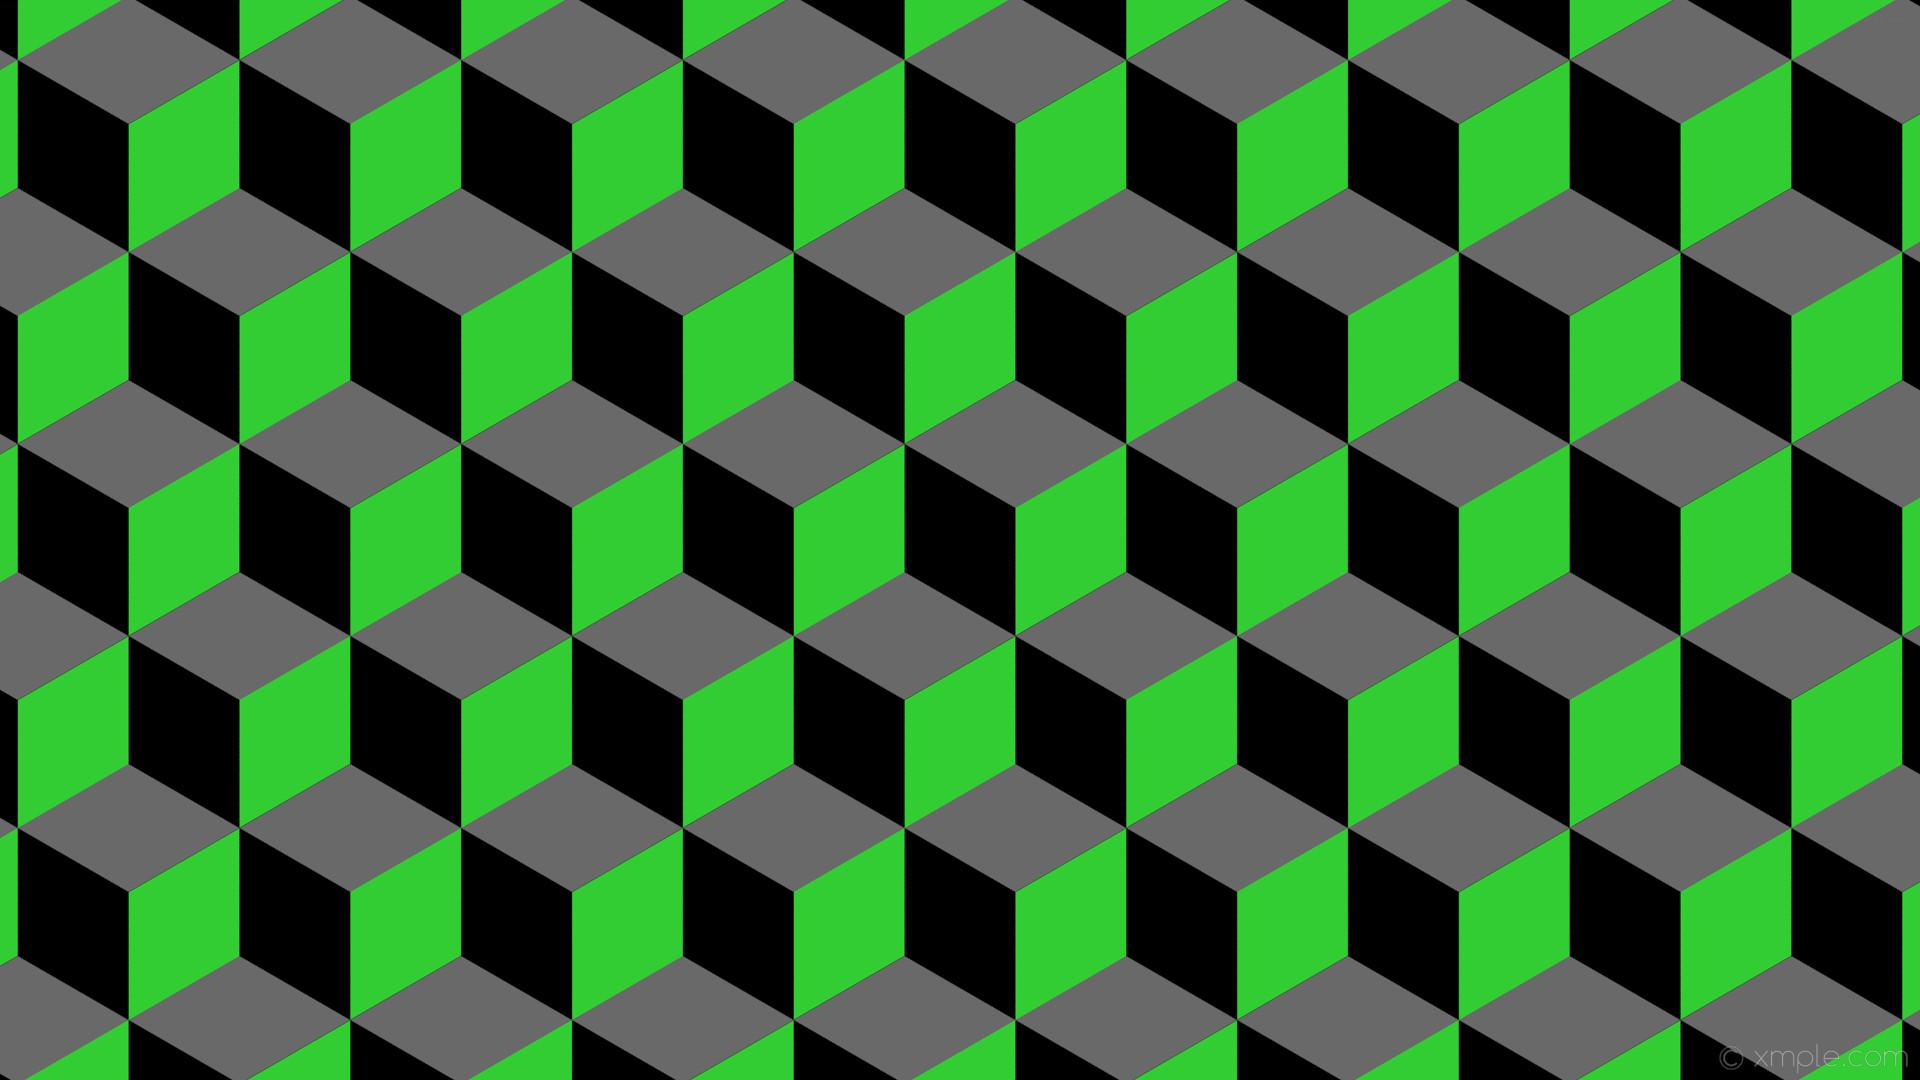 wallpaper grey green 3d cubes black lime green dim gray #000000 #32cd32  #696969